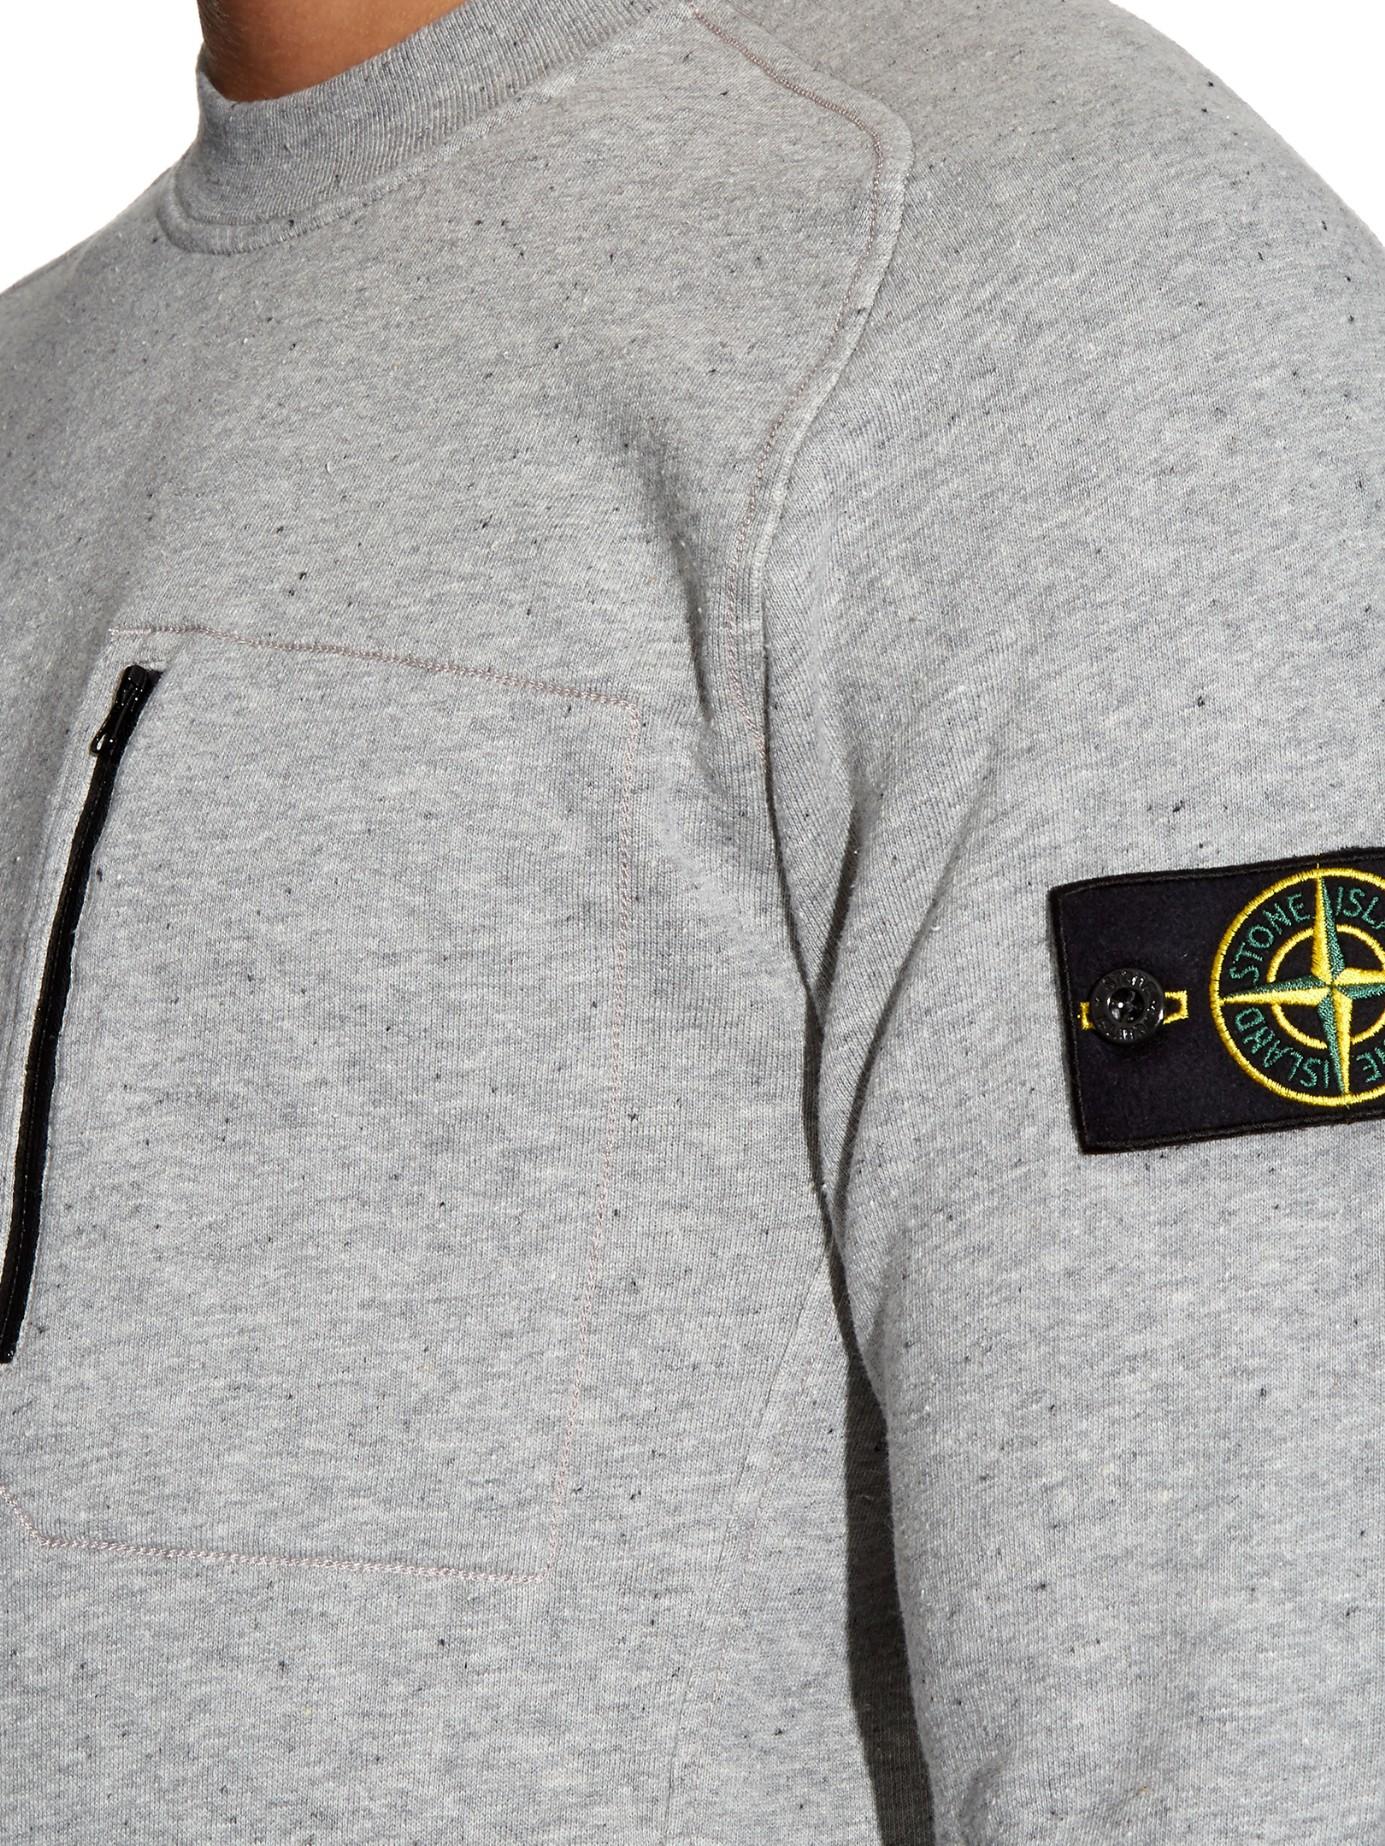 Lyst Stone Island Zip Pocket Cotton Fleece Sweatshirt In